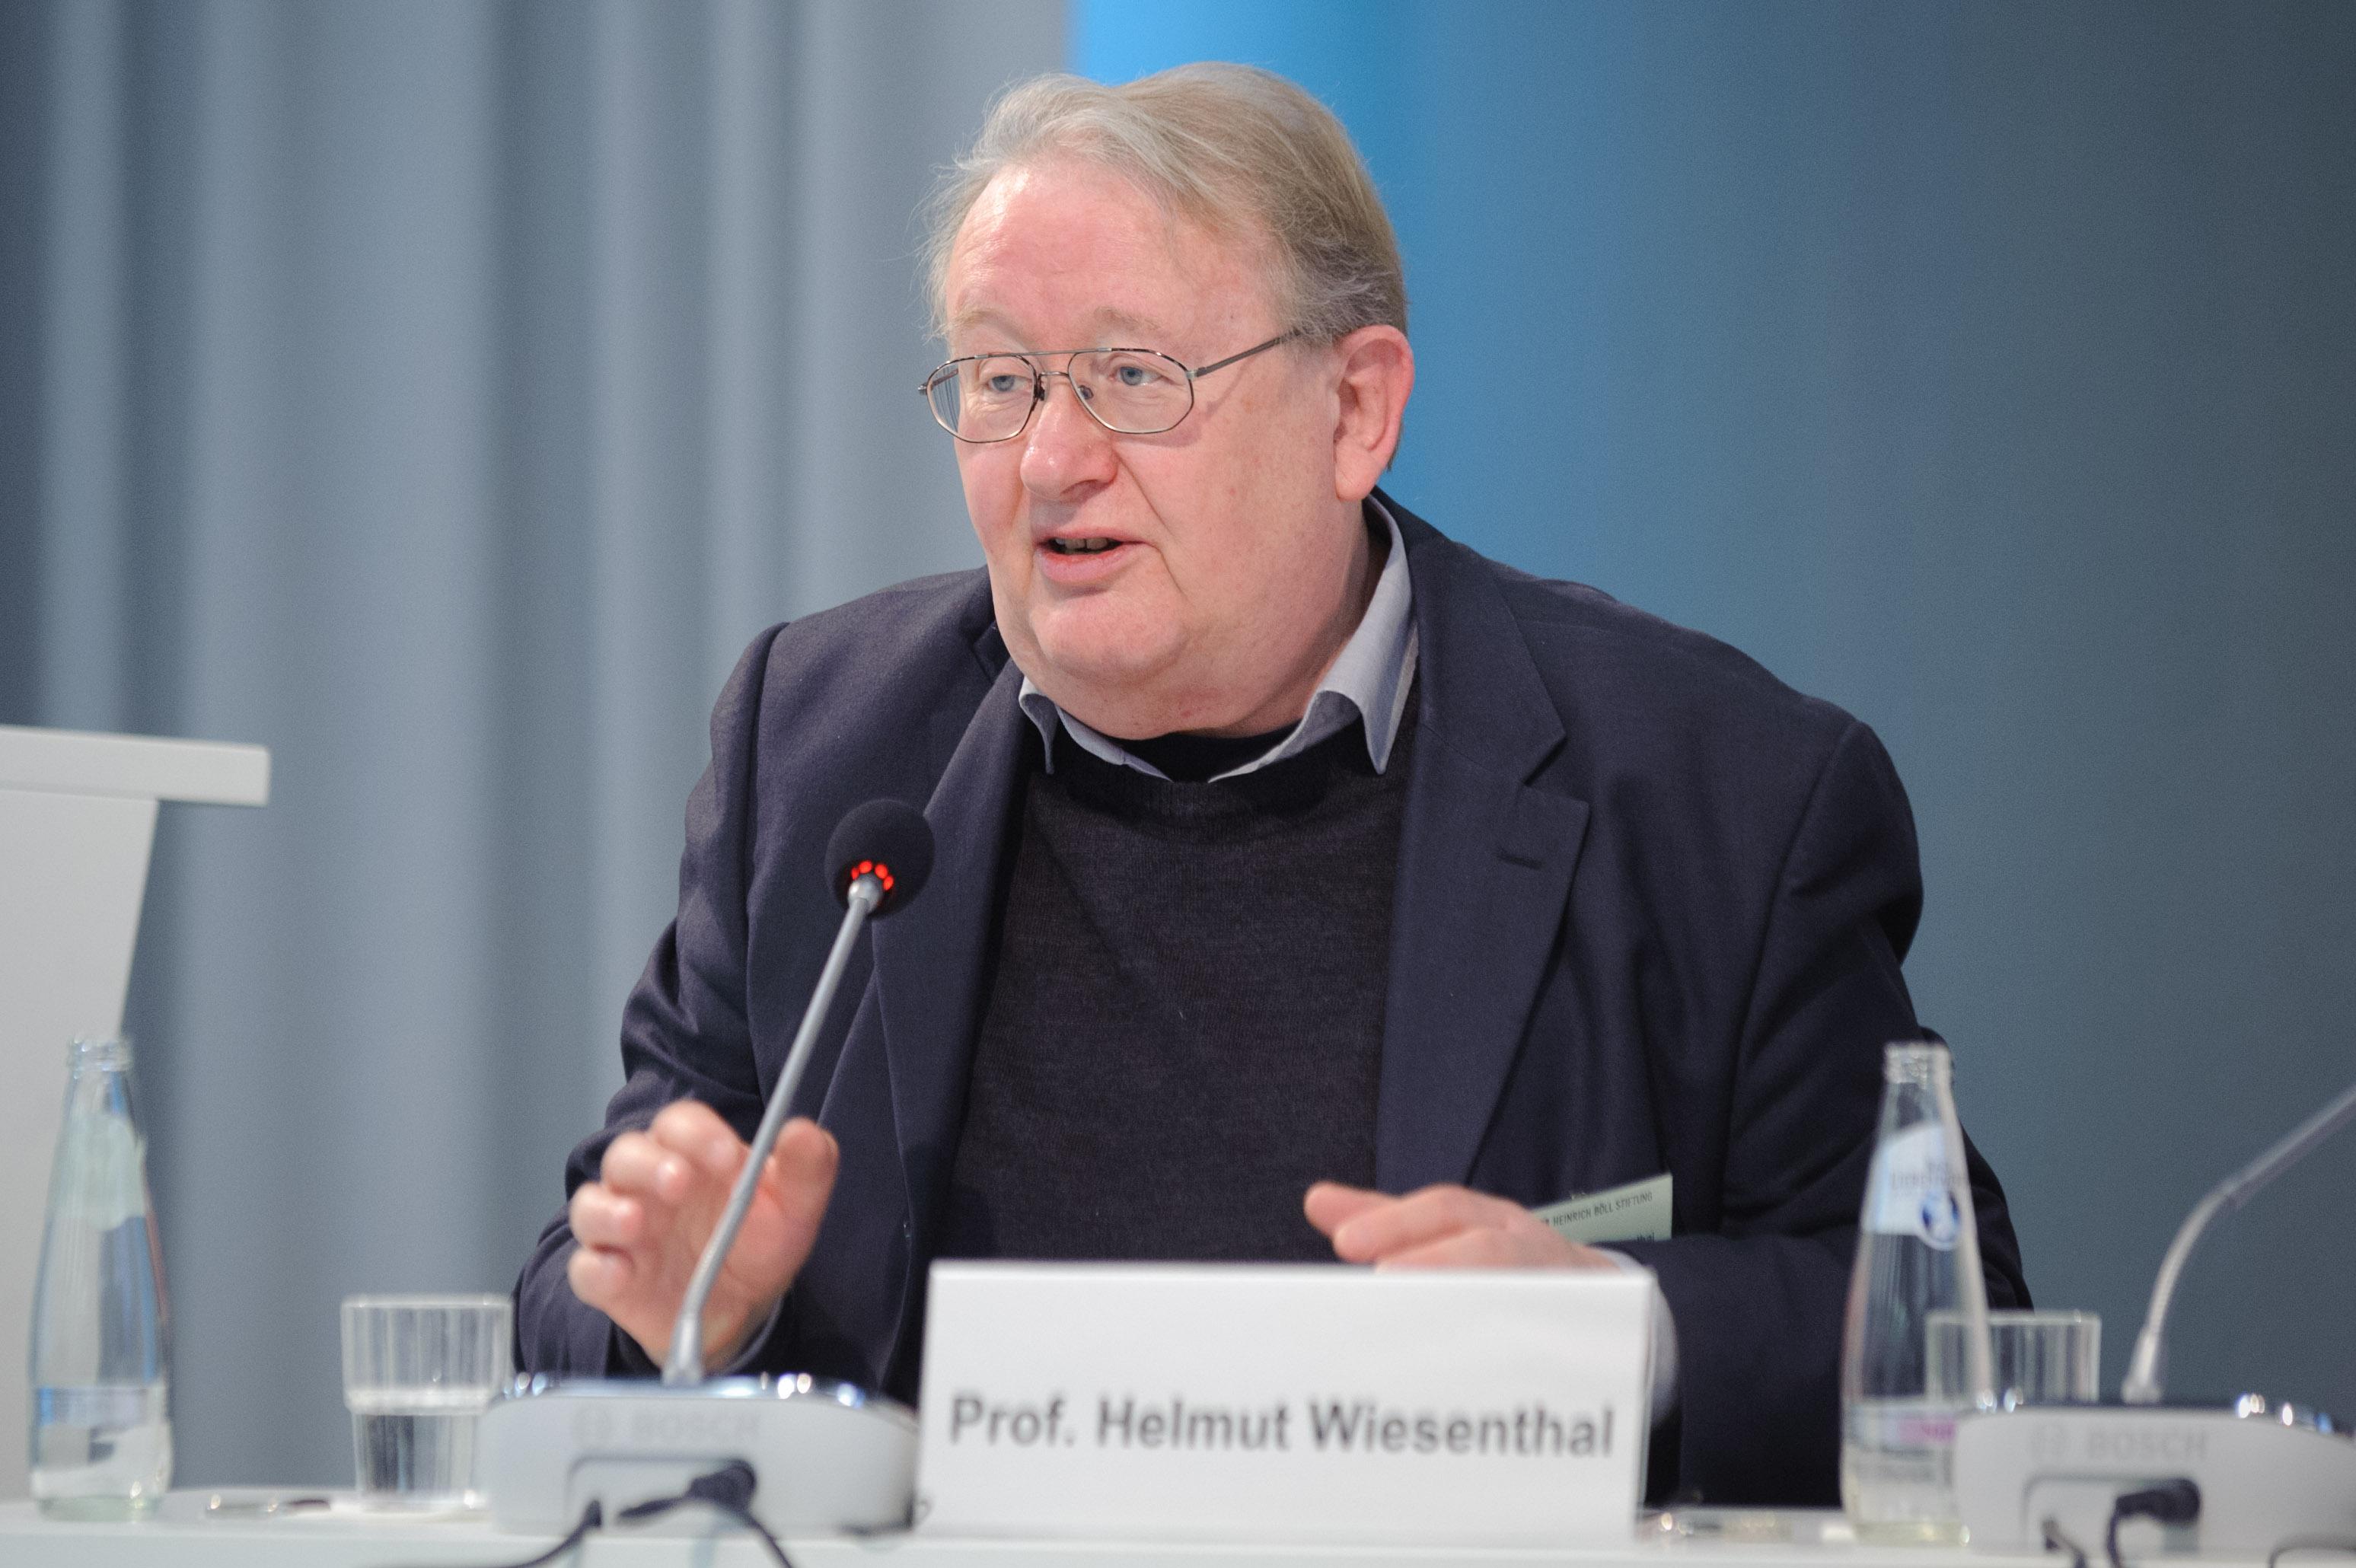 Helmut Wiesenthal – Wikipedia